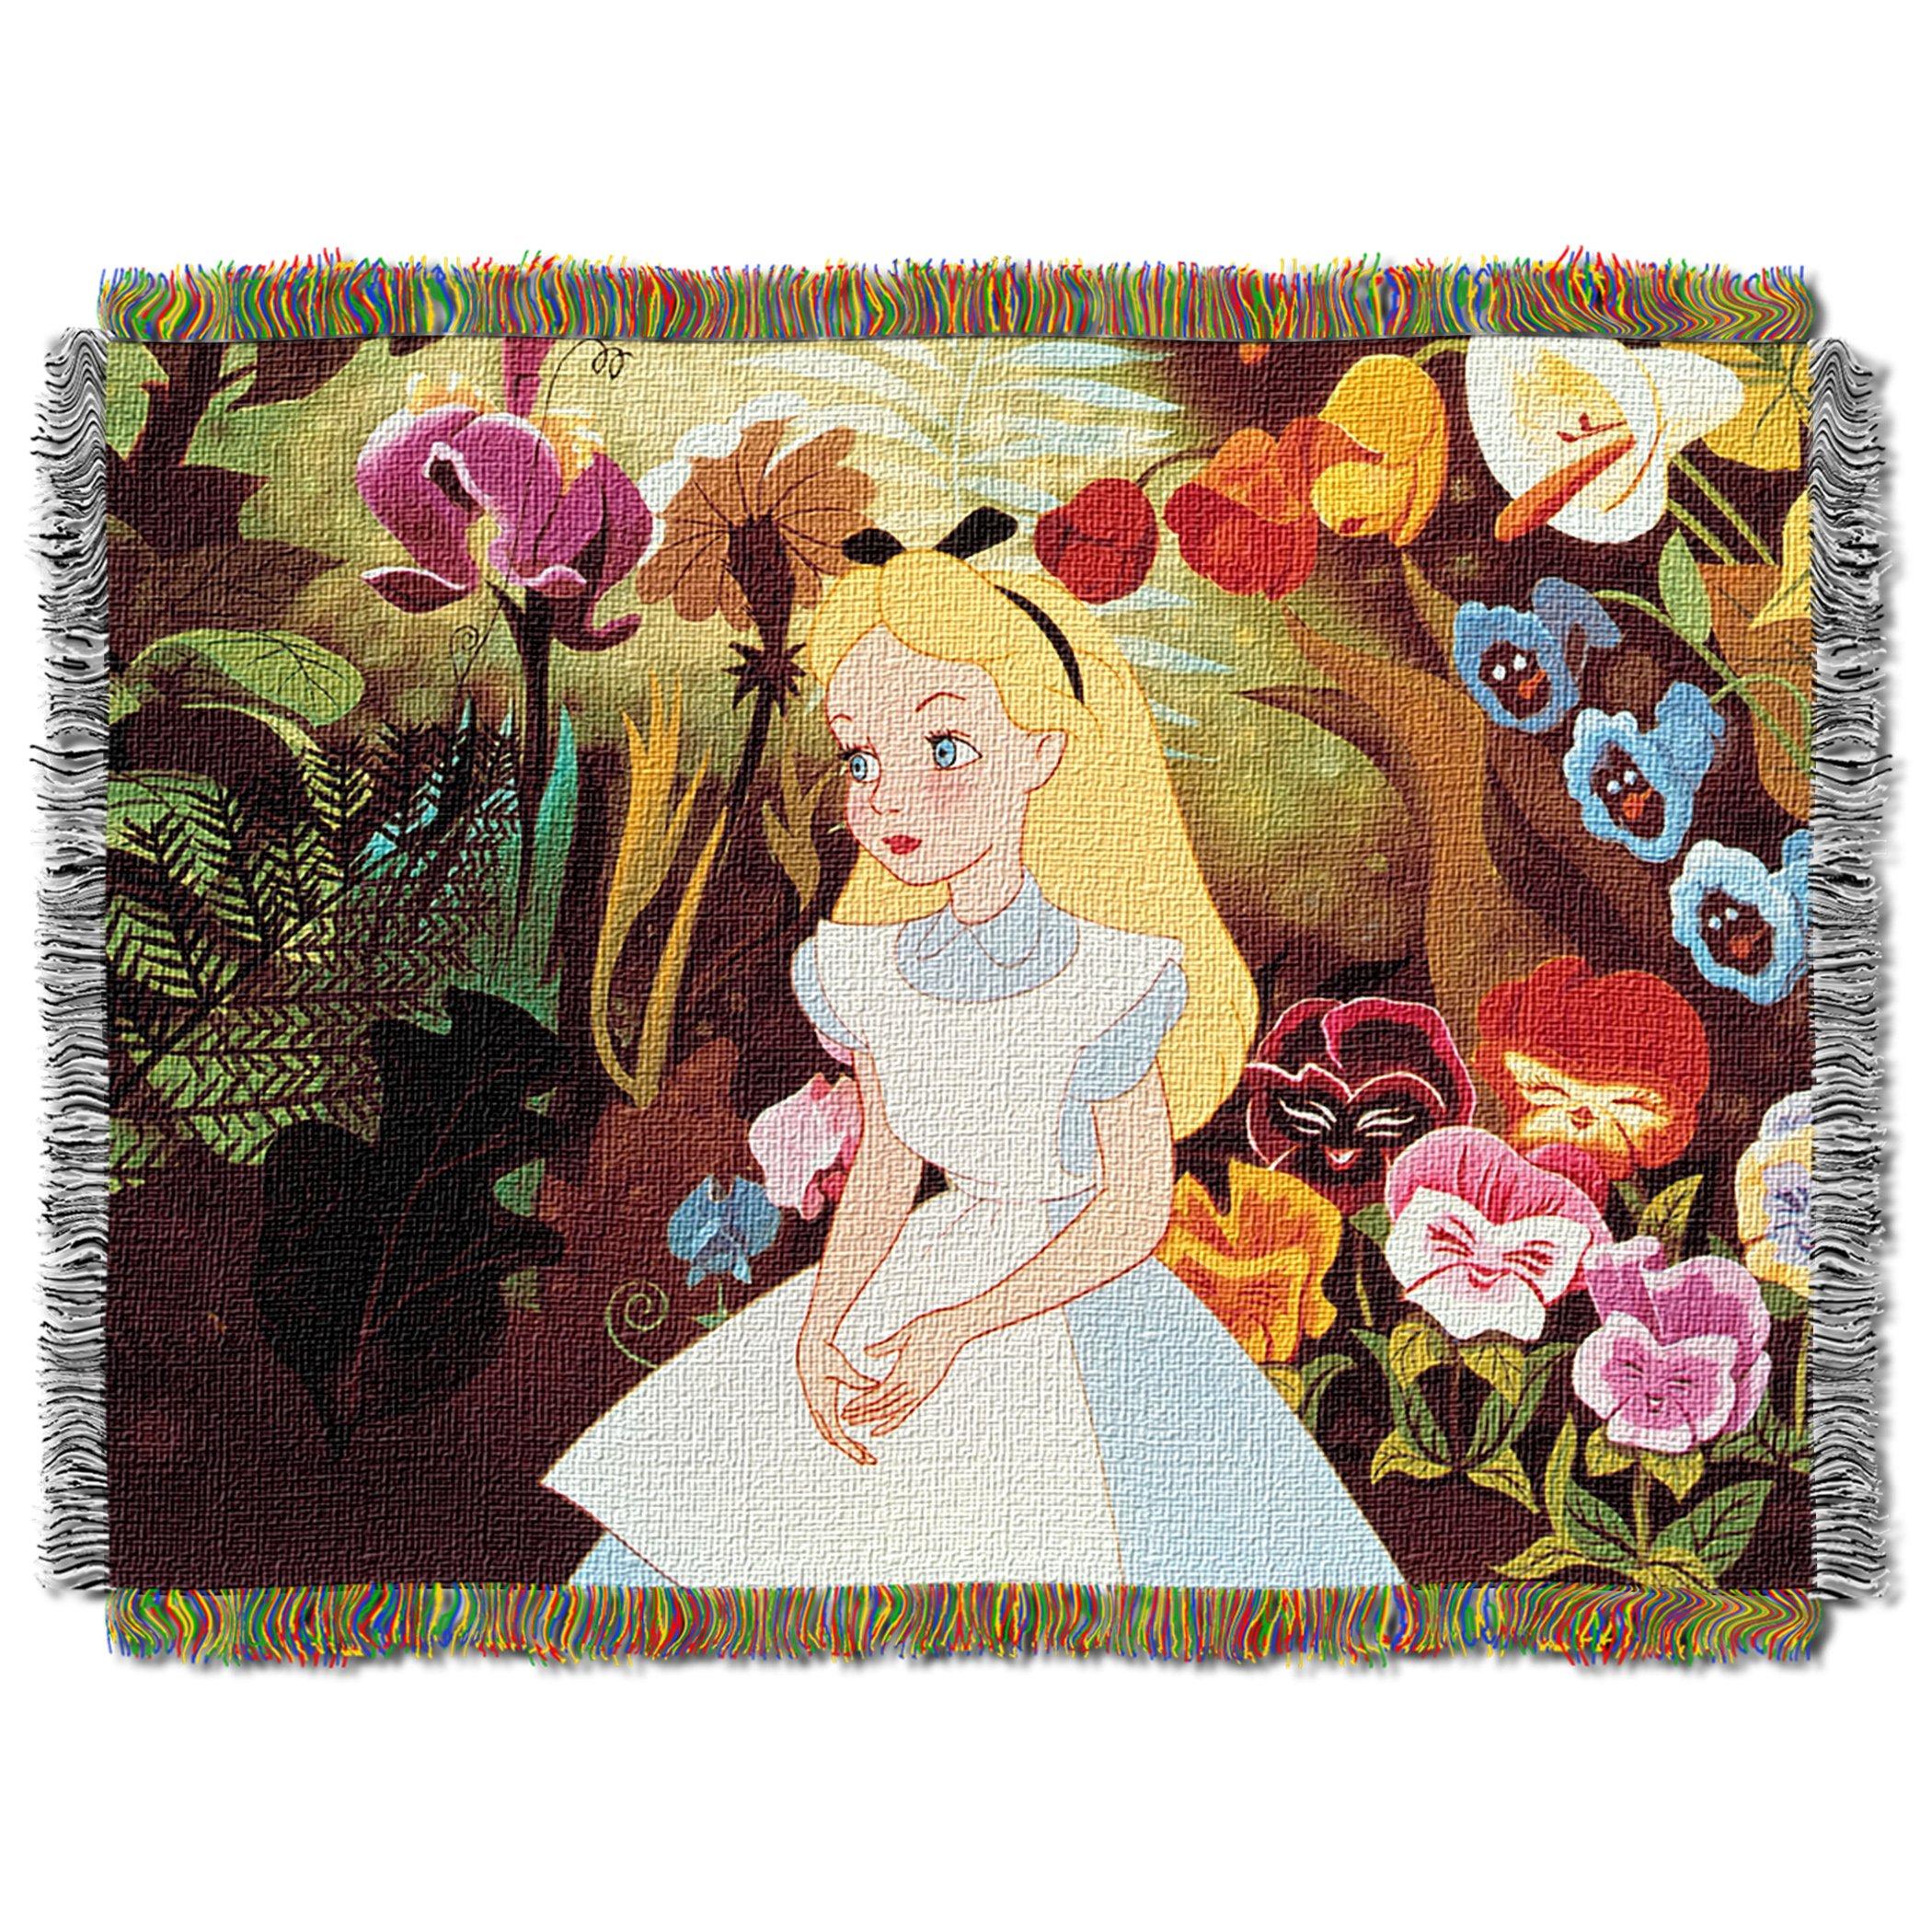 Disney Alice in Wonderland, ''Alice in the Garden'' Woven Tapestry Throw Blanket, 48'' x 60'' by Disney